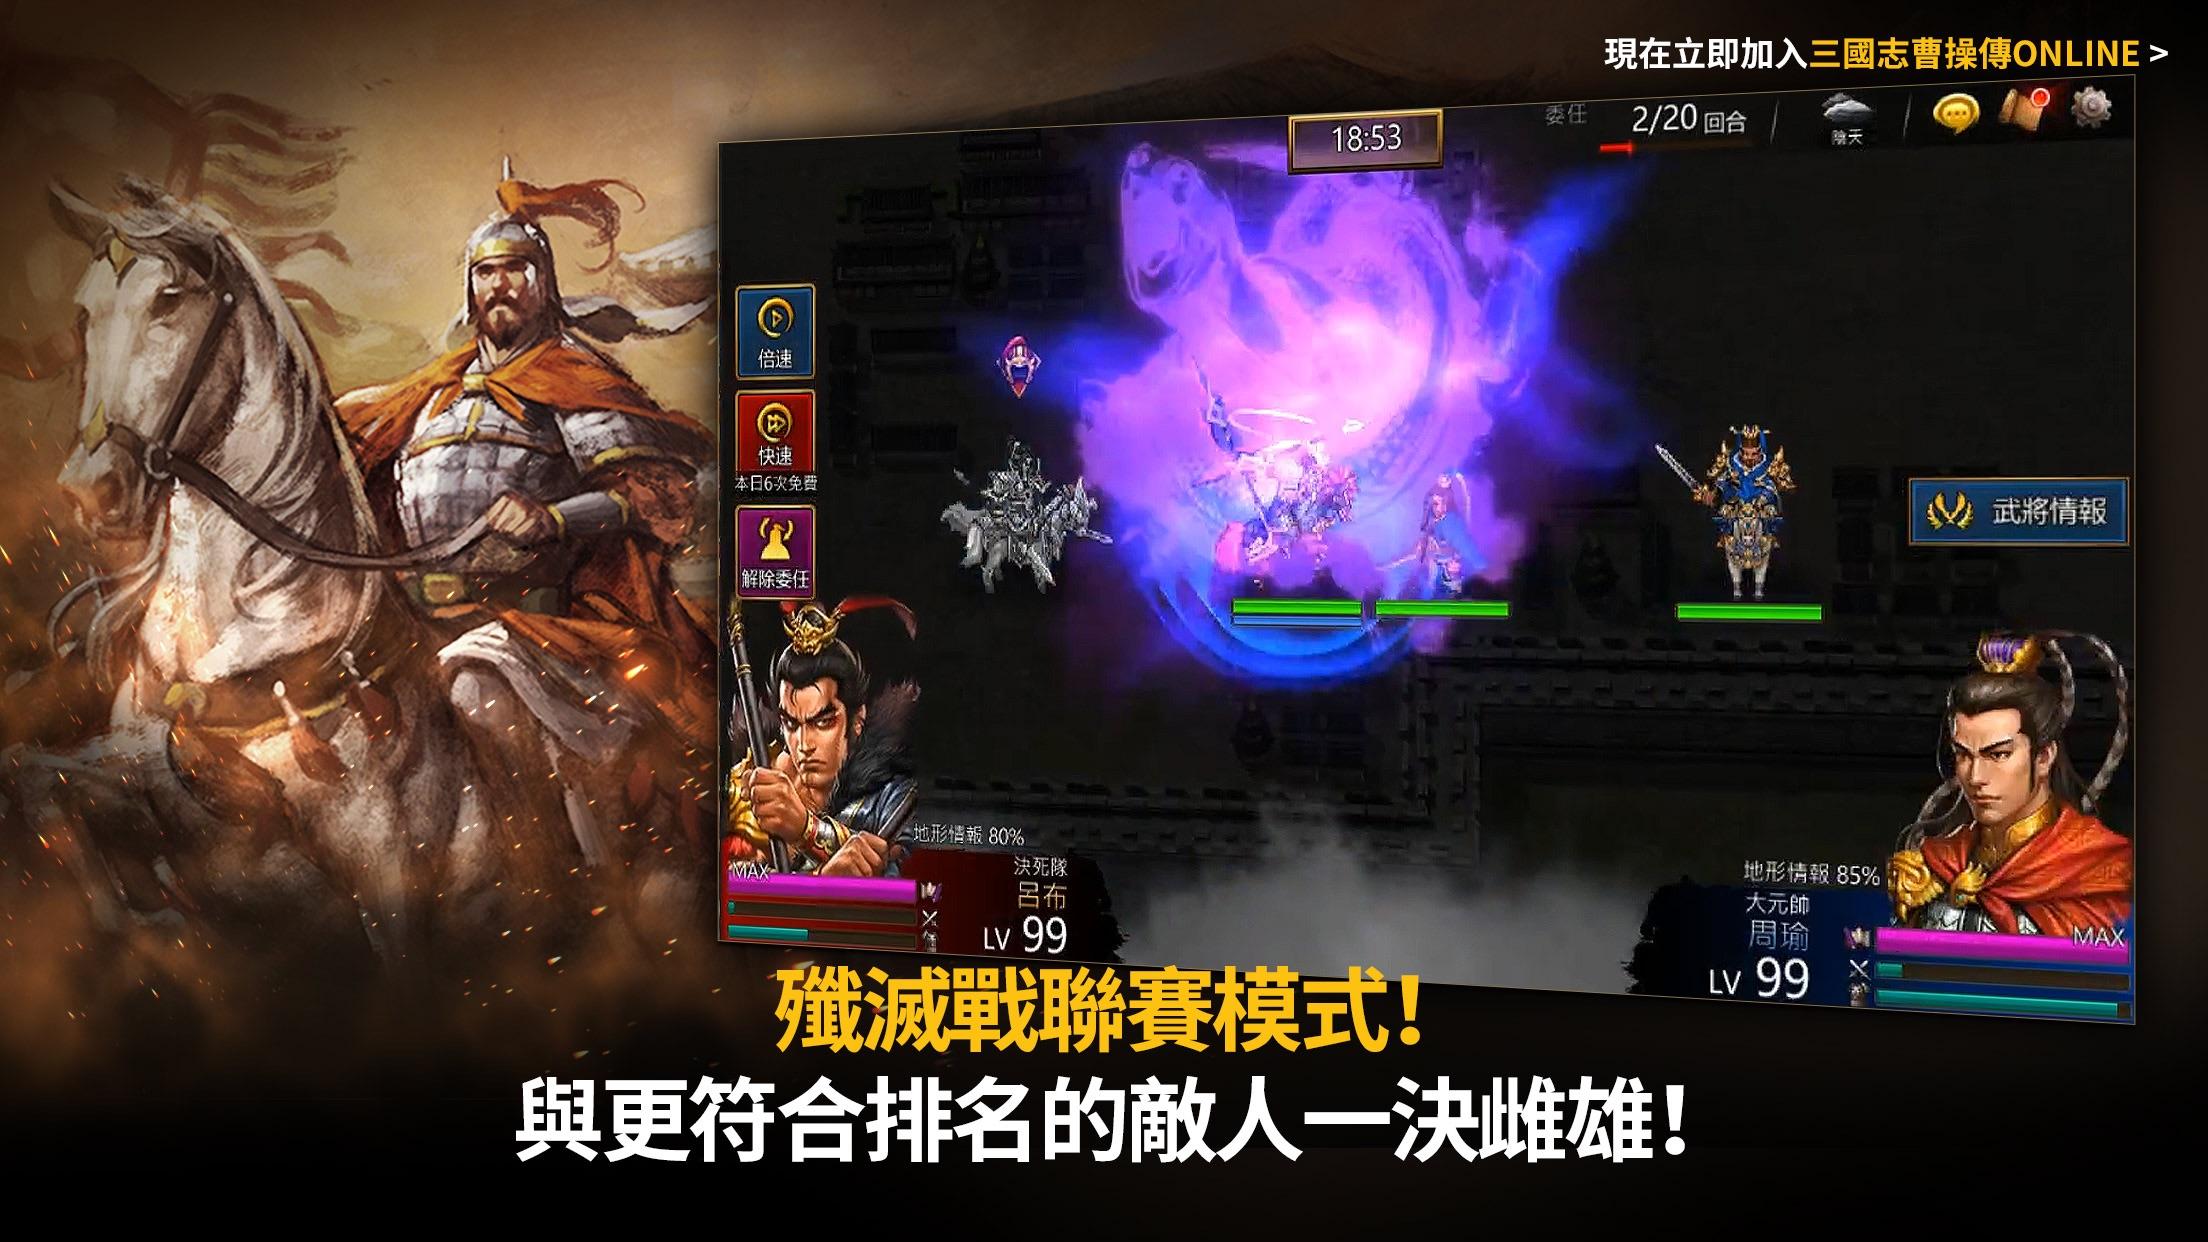 三國志曹操傳 Online Screenshot